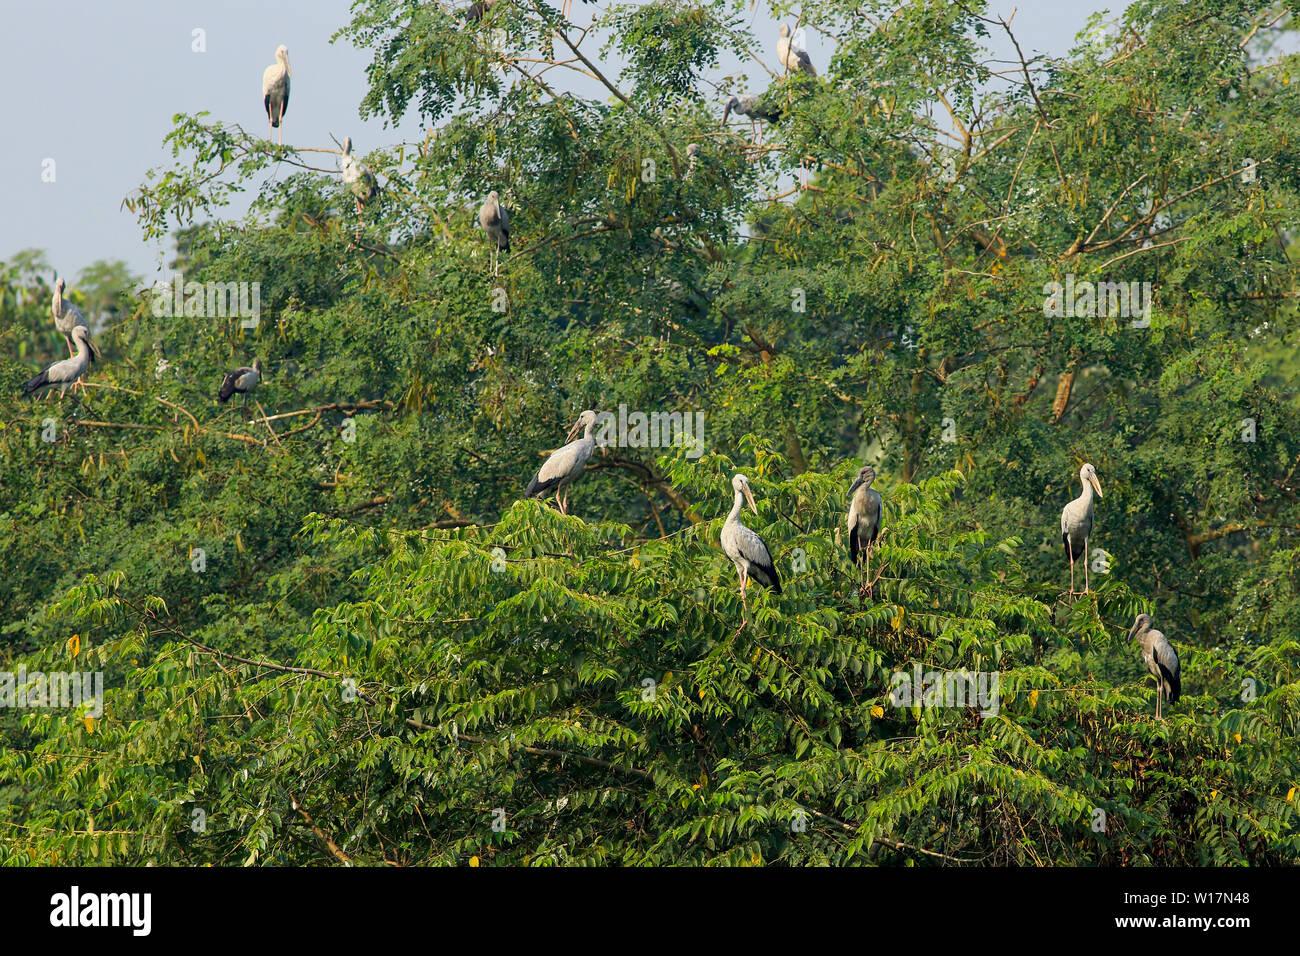 Asian Openbill locally called Shamukkhol on the tree at Jahangirnagar University, Dhaka, Bangladesh - Stock Image